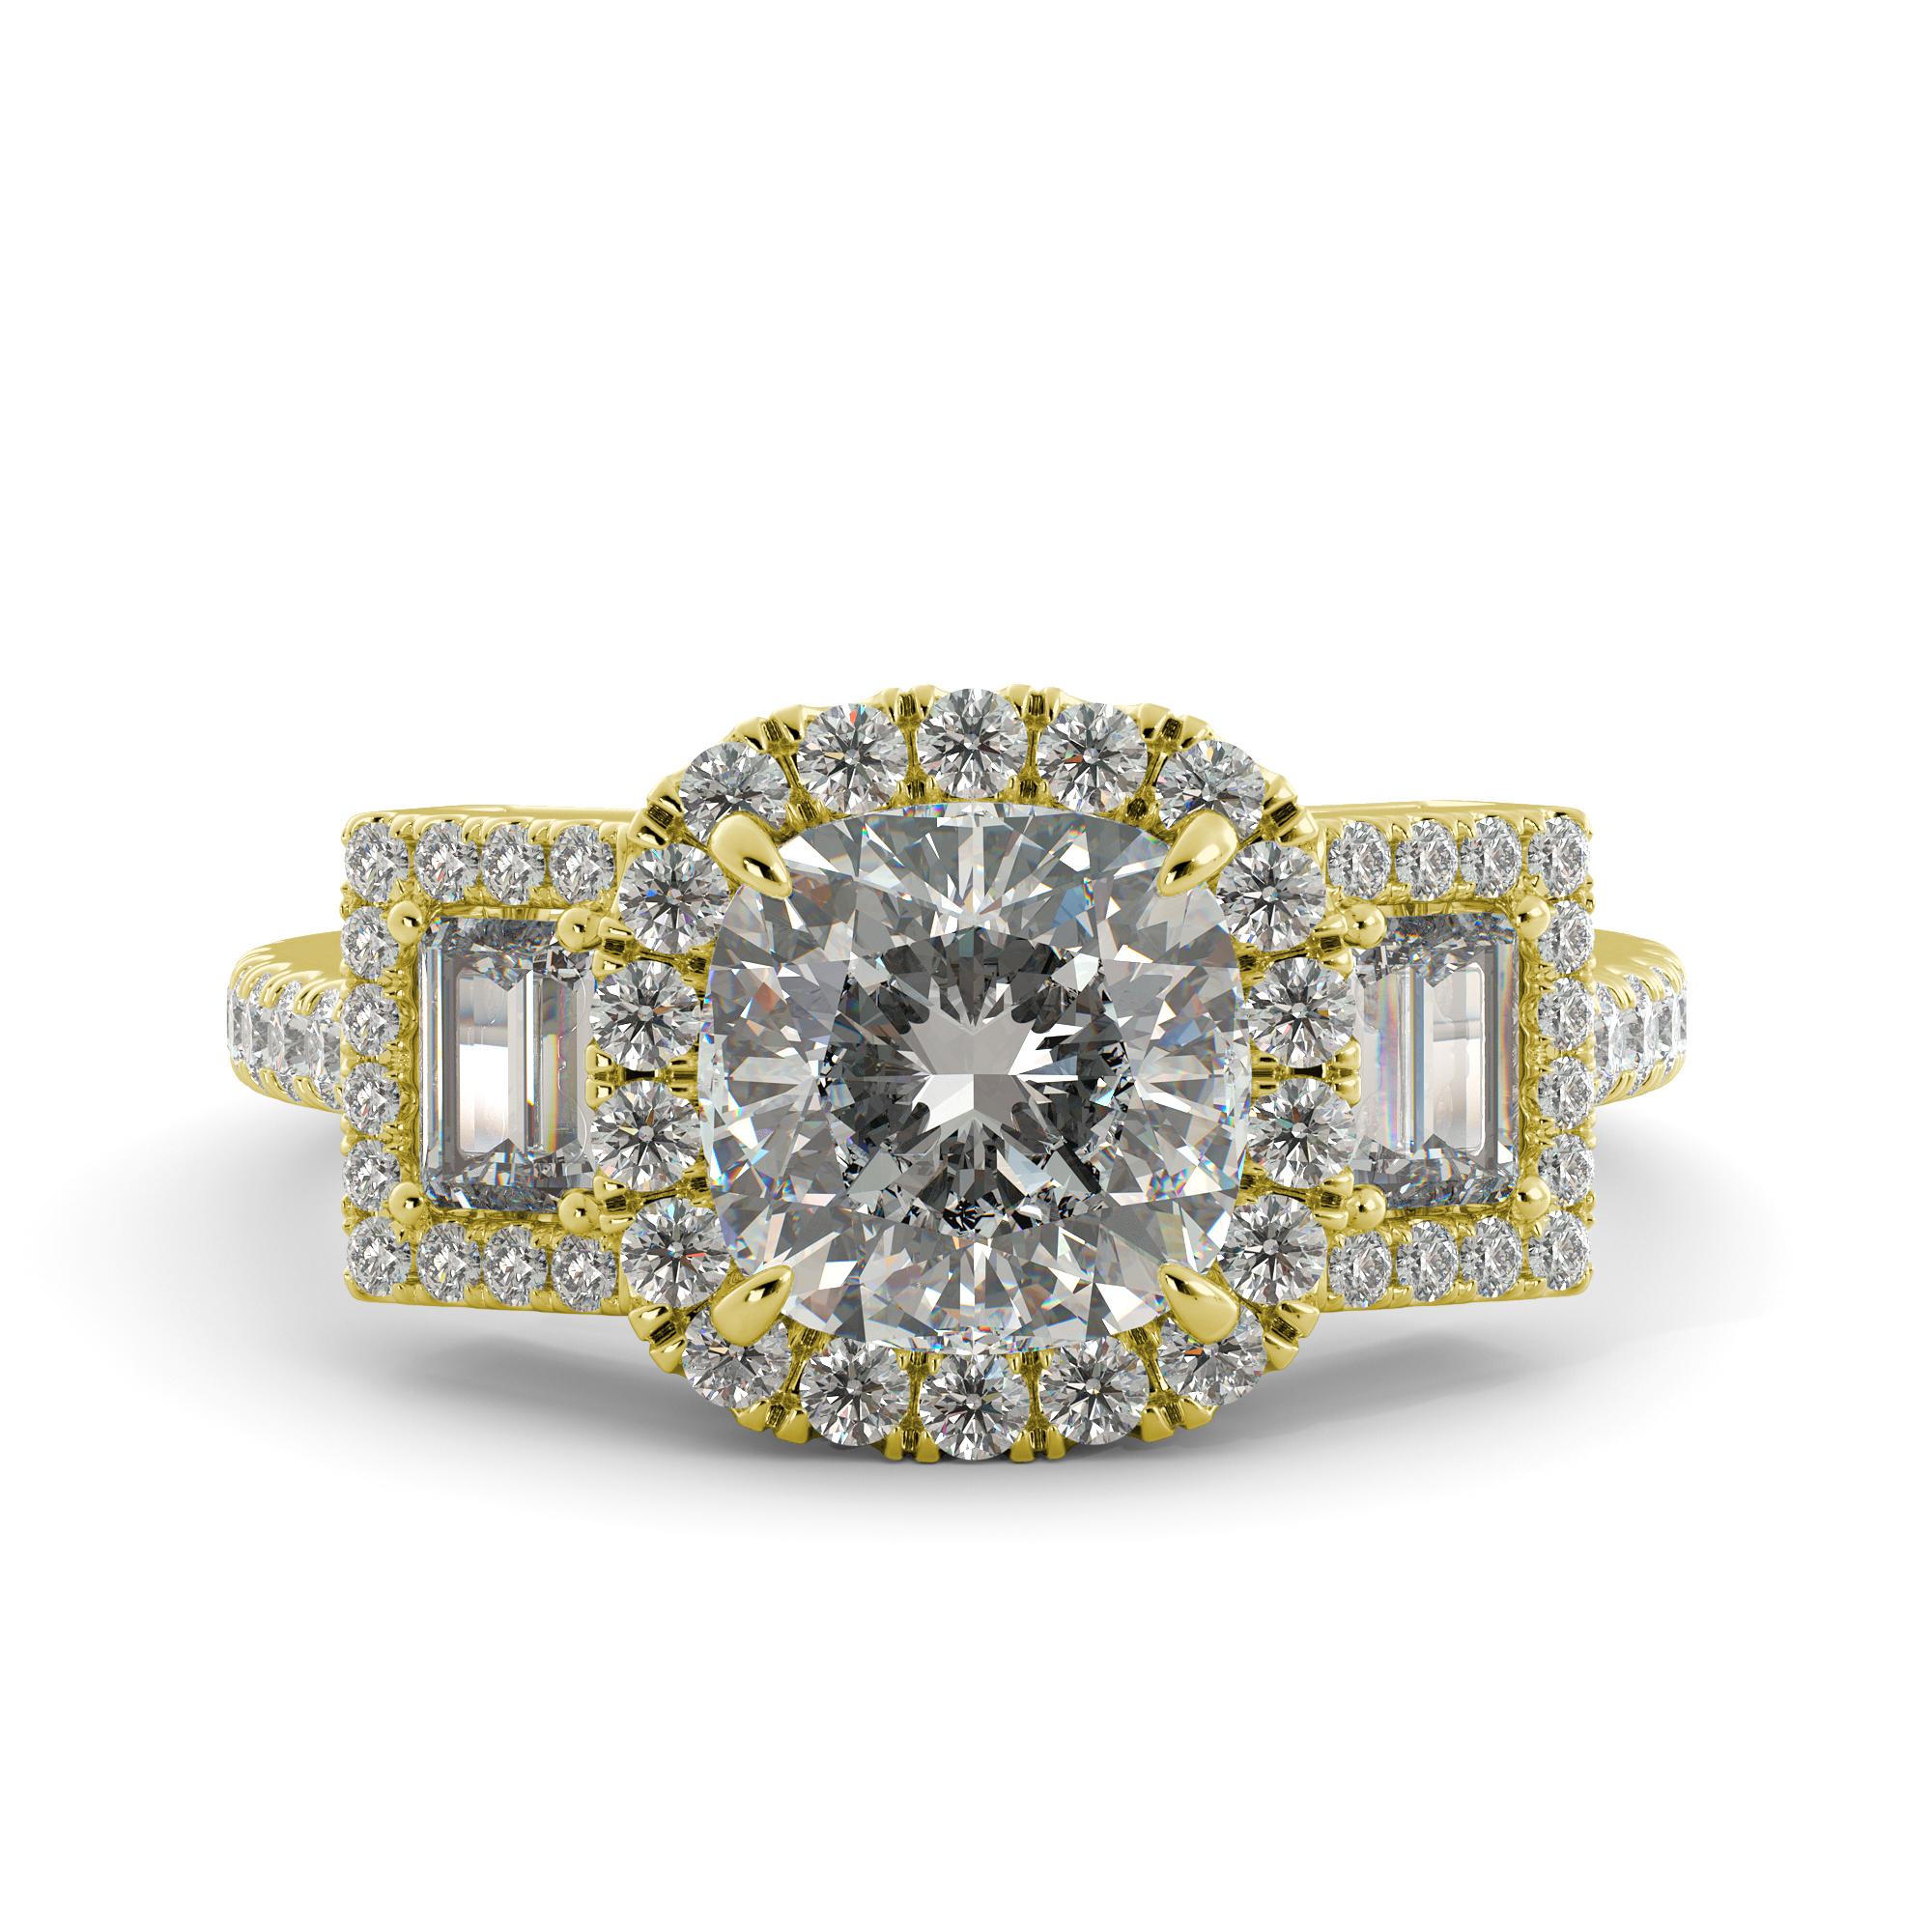 3.10 ct Cushion C&C Brilliant Moissanite & Round Diamond Engagement Ring 14k Rose Gold